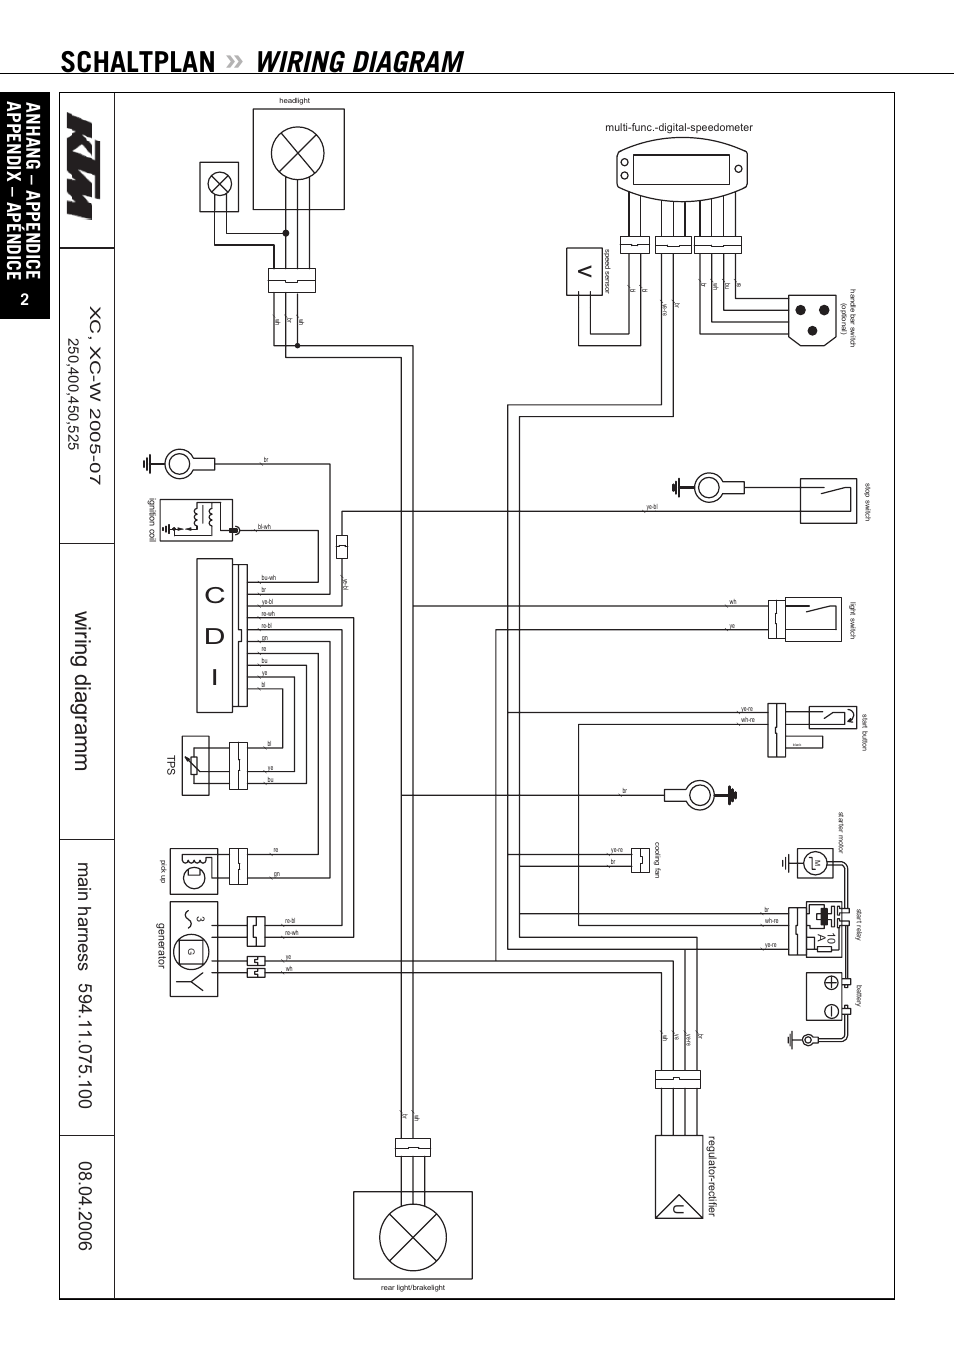 ktm 200 exc wiring diagram 2006 ktm 525 exc wiring diagram ktm 525 sx wiring diagram | wiring diagram